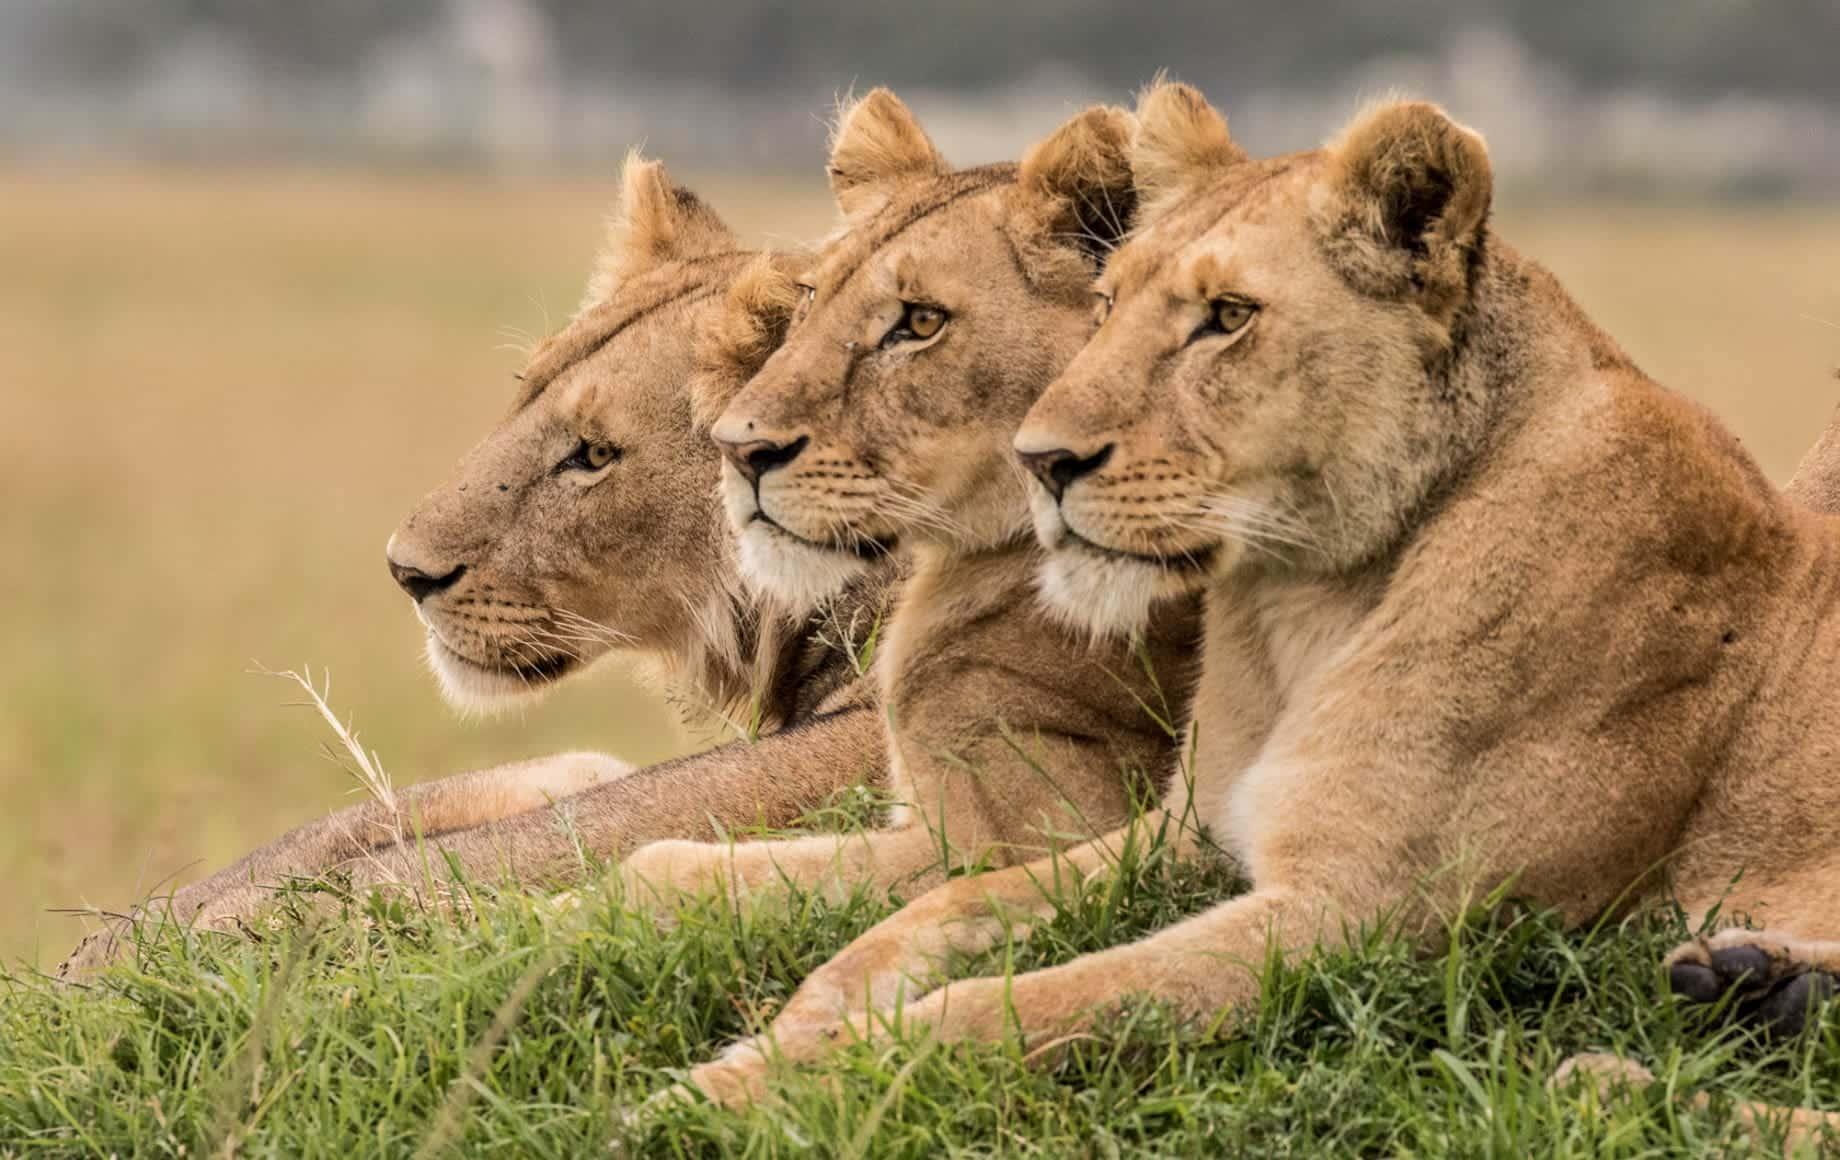 Three lions sitting on grass